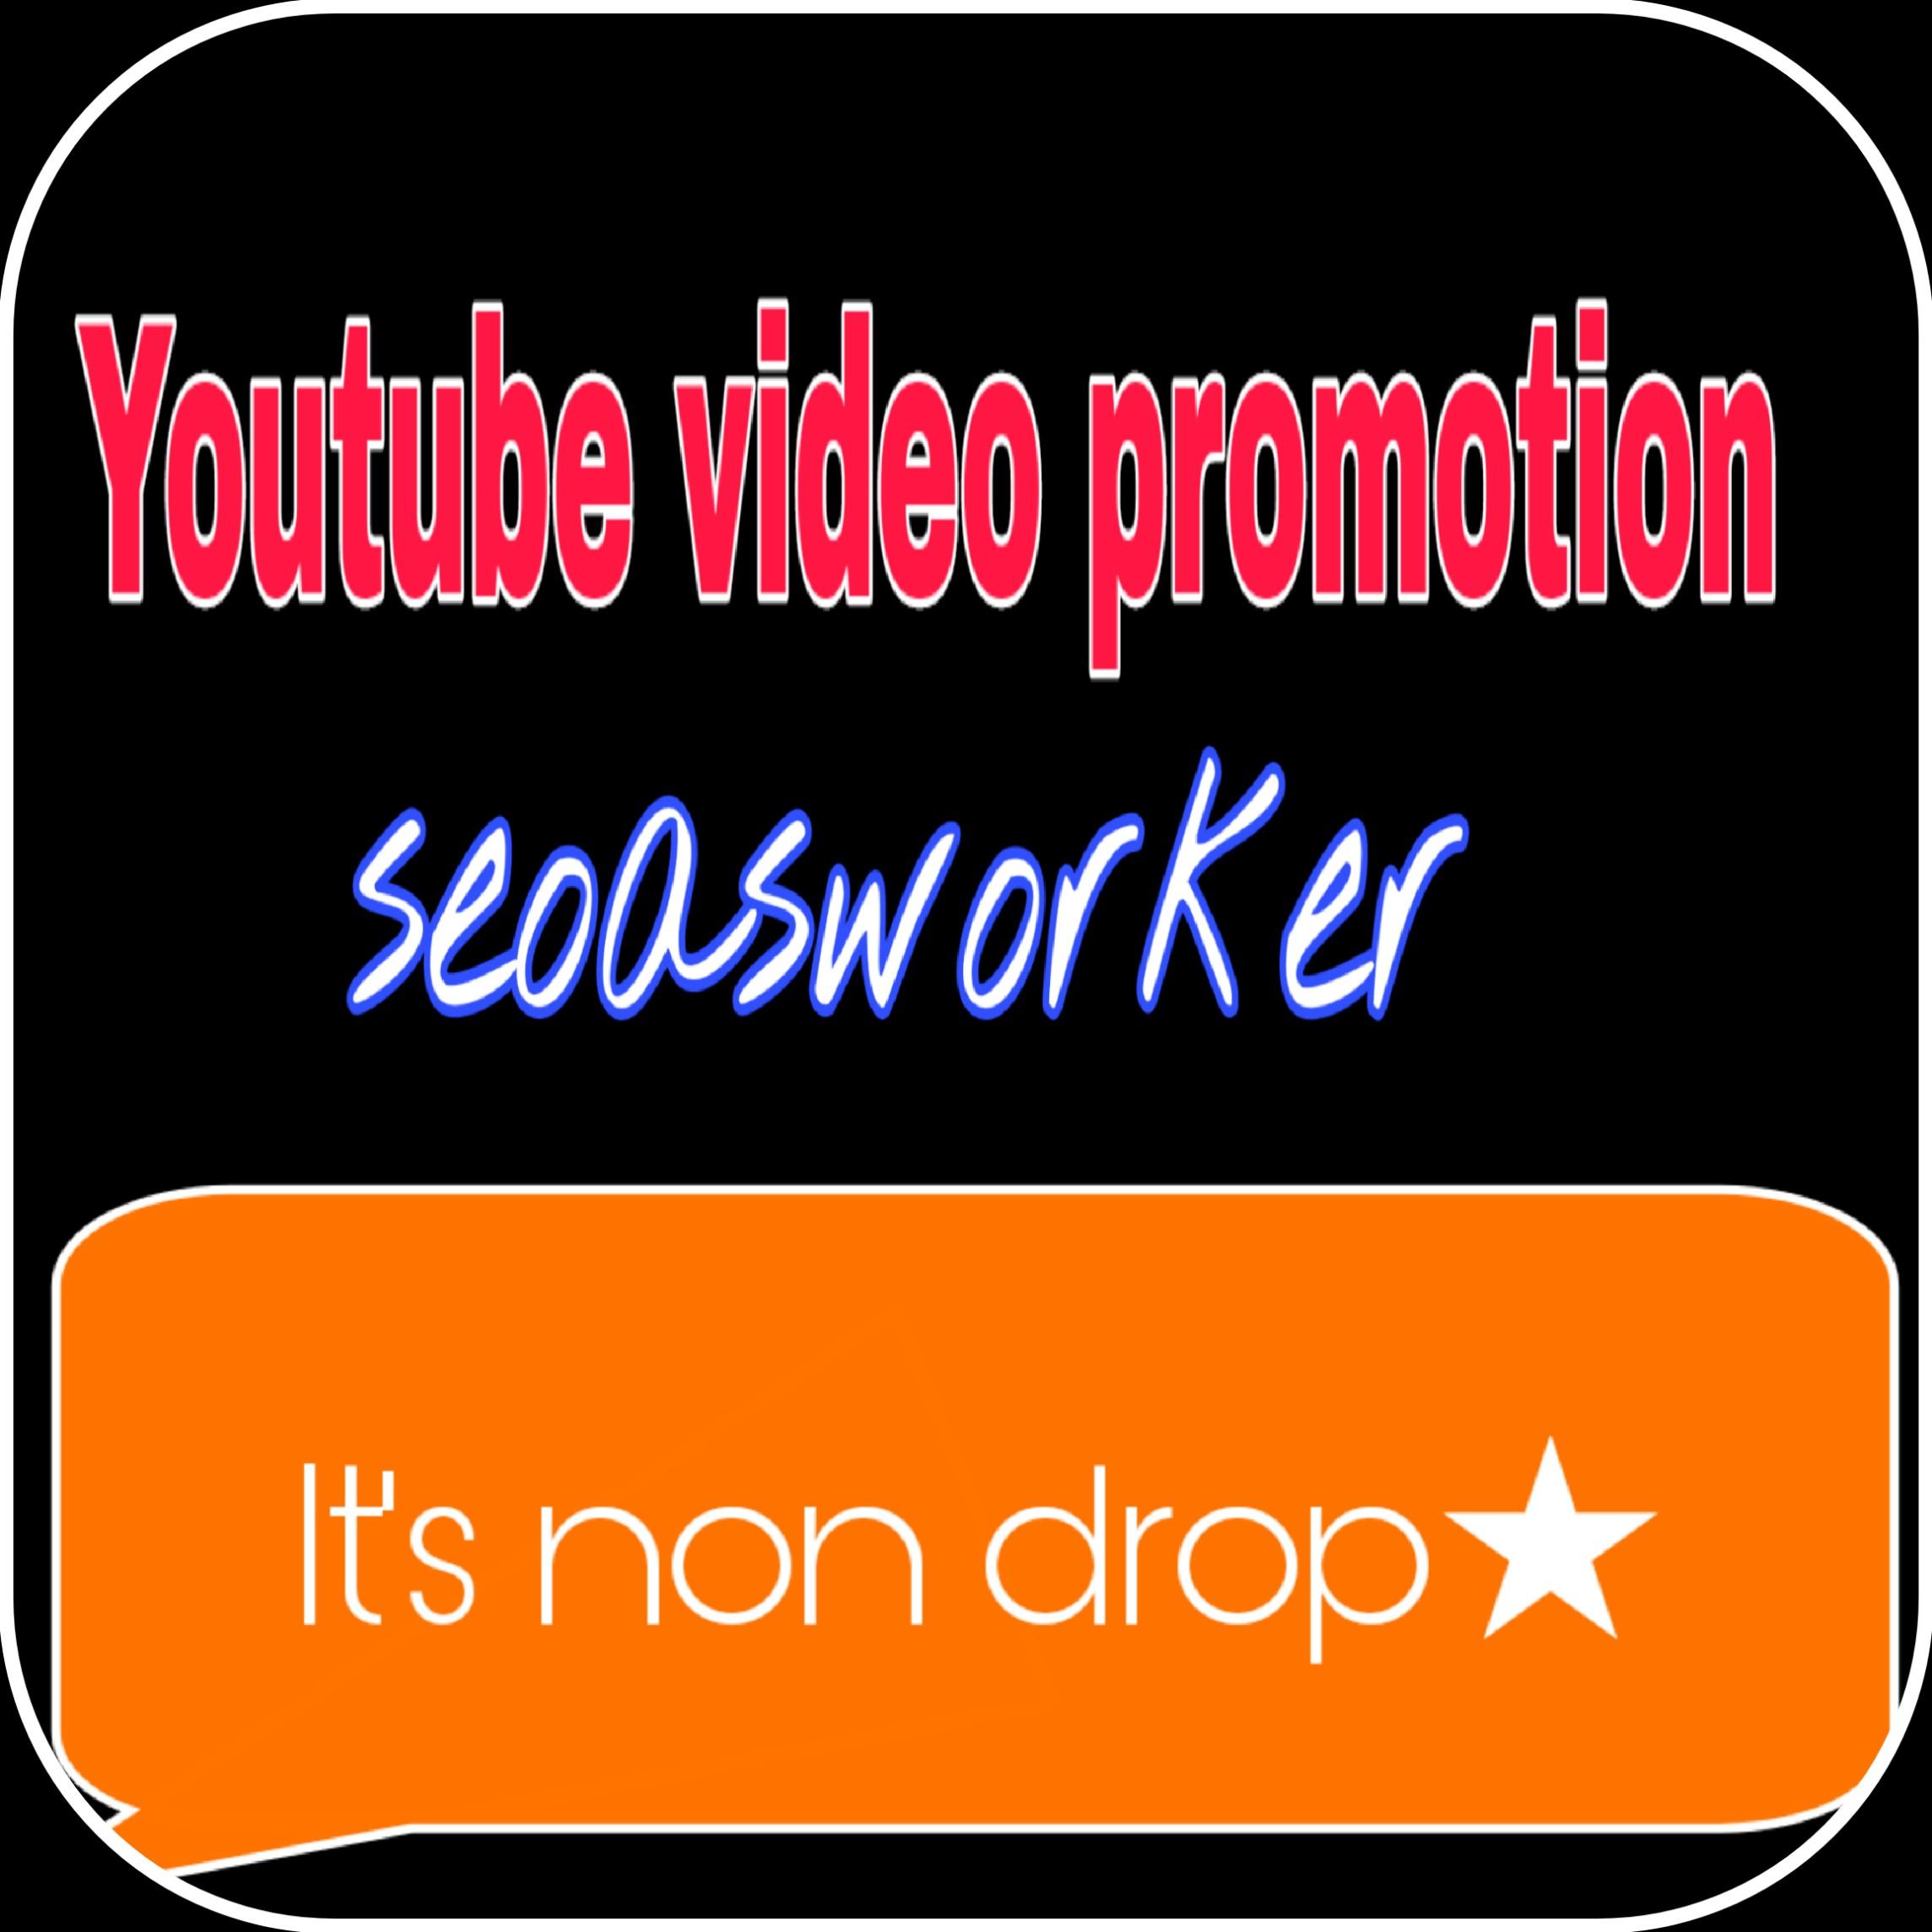 Youtube-video-promotion-social-media-marketing-ranks